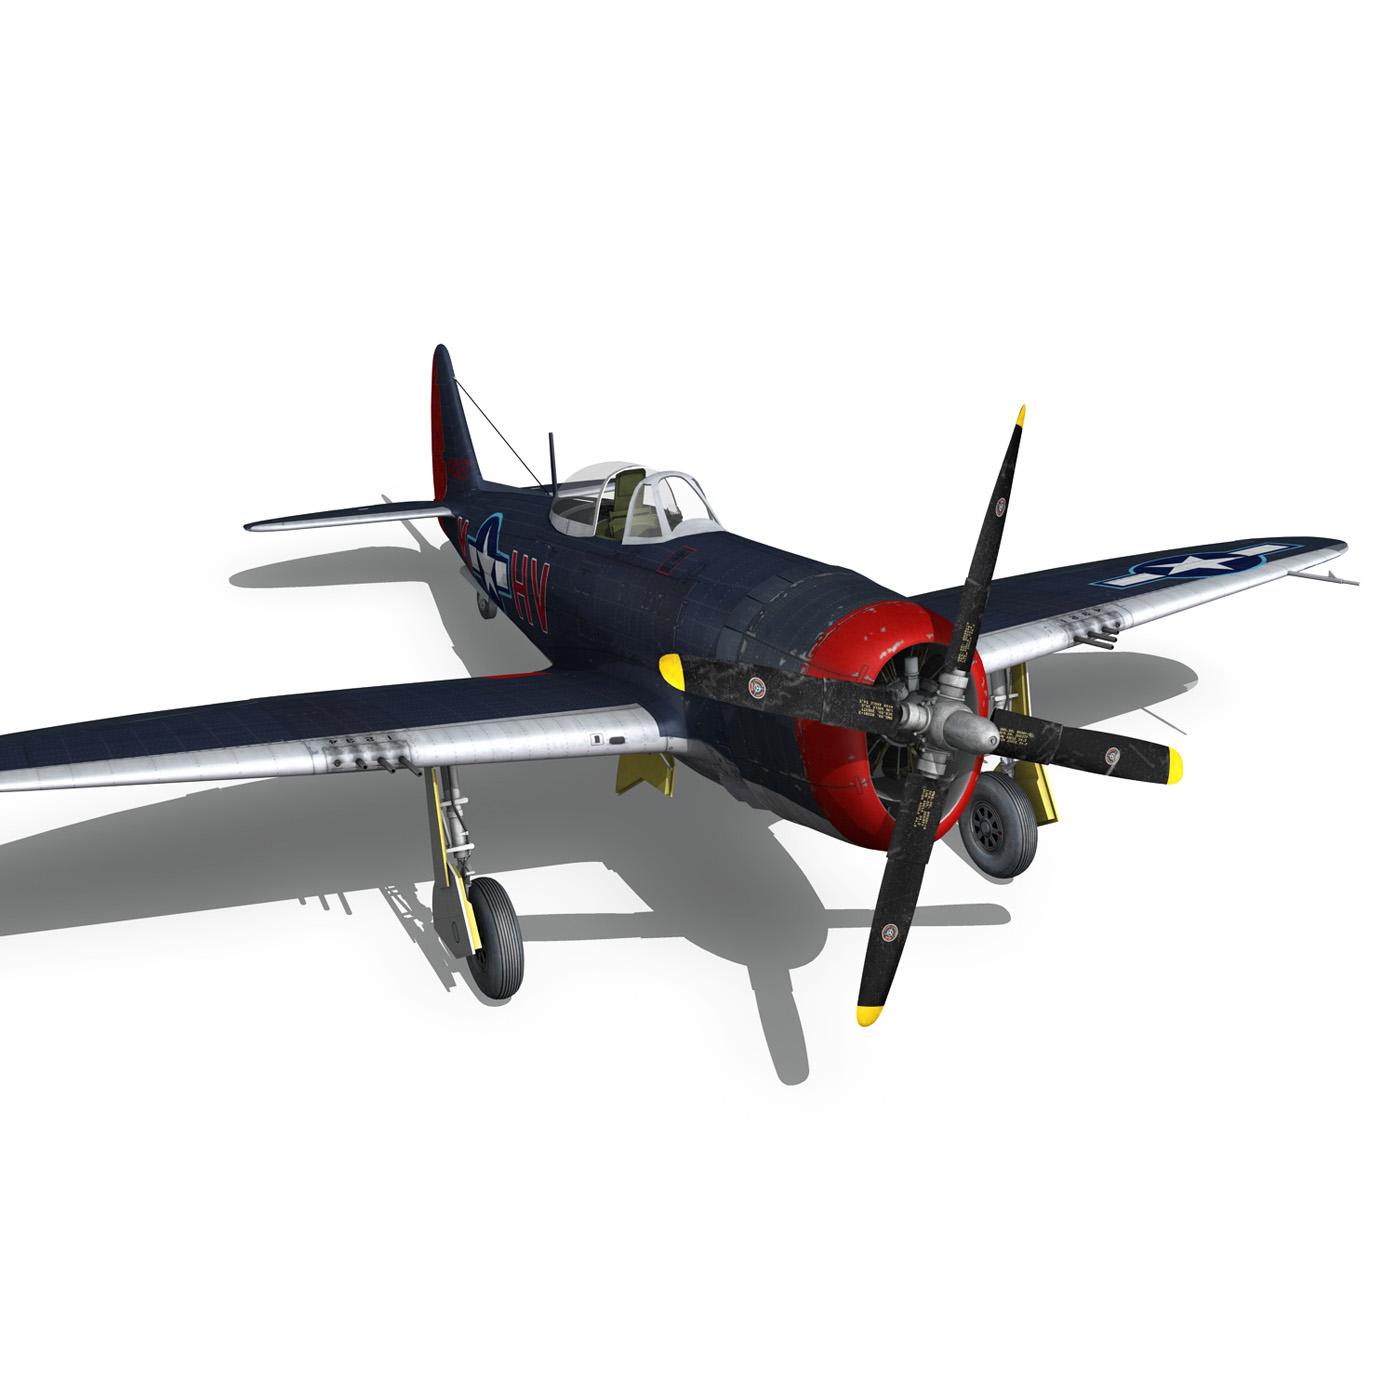 republic p-47m thunderbolt – pengie v 3d model 3ds c4d fbx lwo lw lws obj 279730